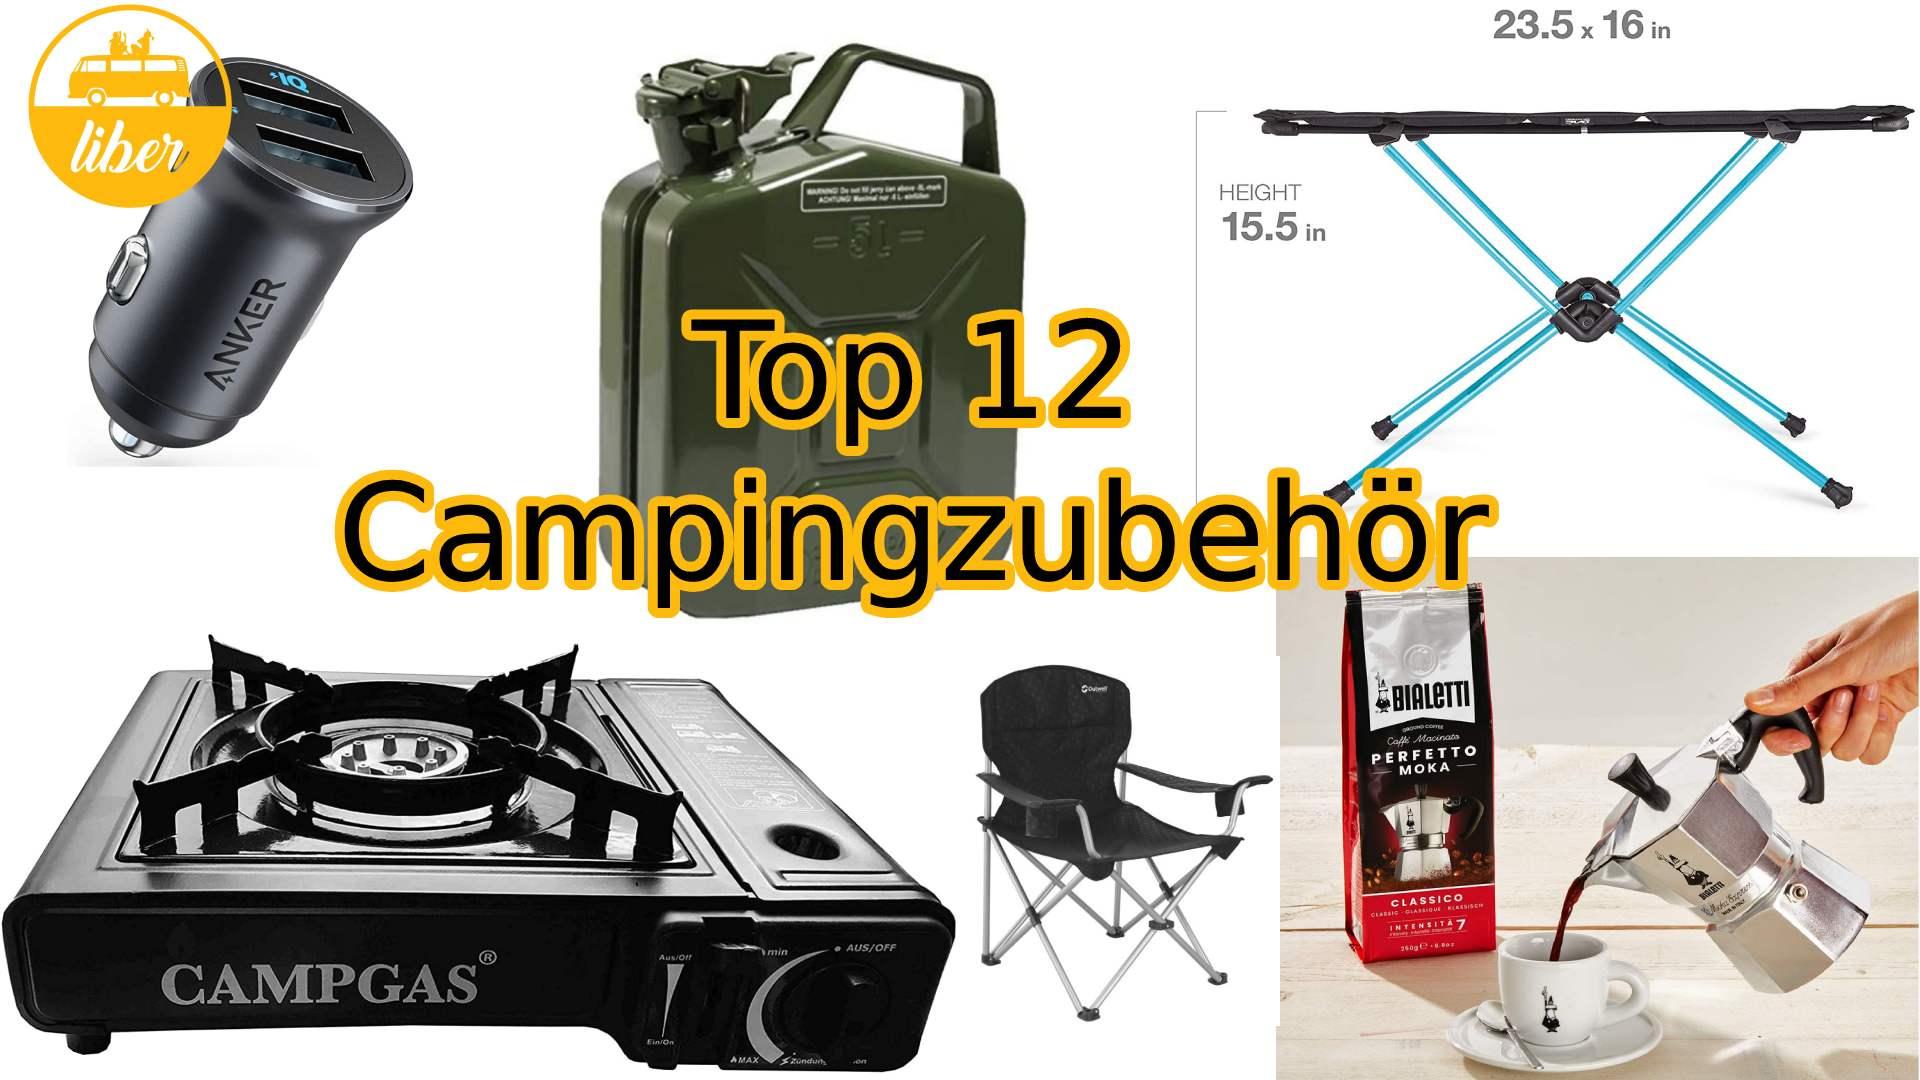 Top-12-Campingzubehör-Gadgets-Must-Have